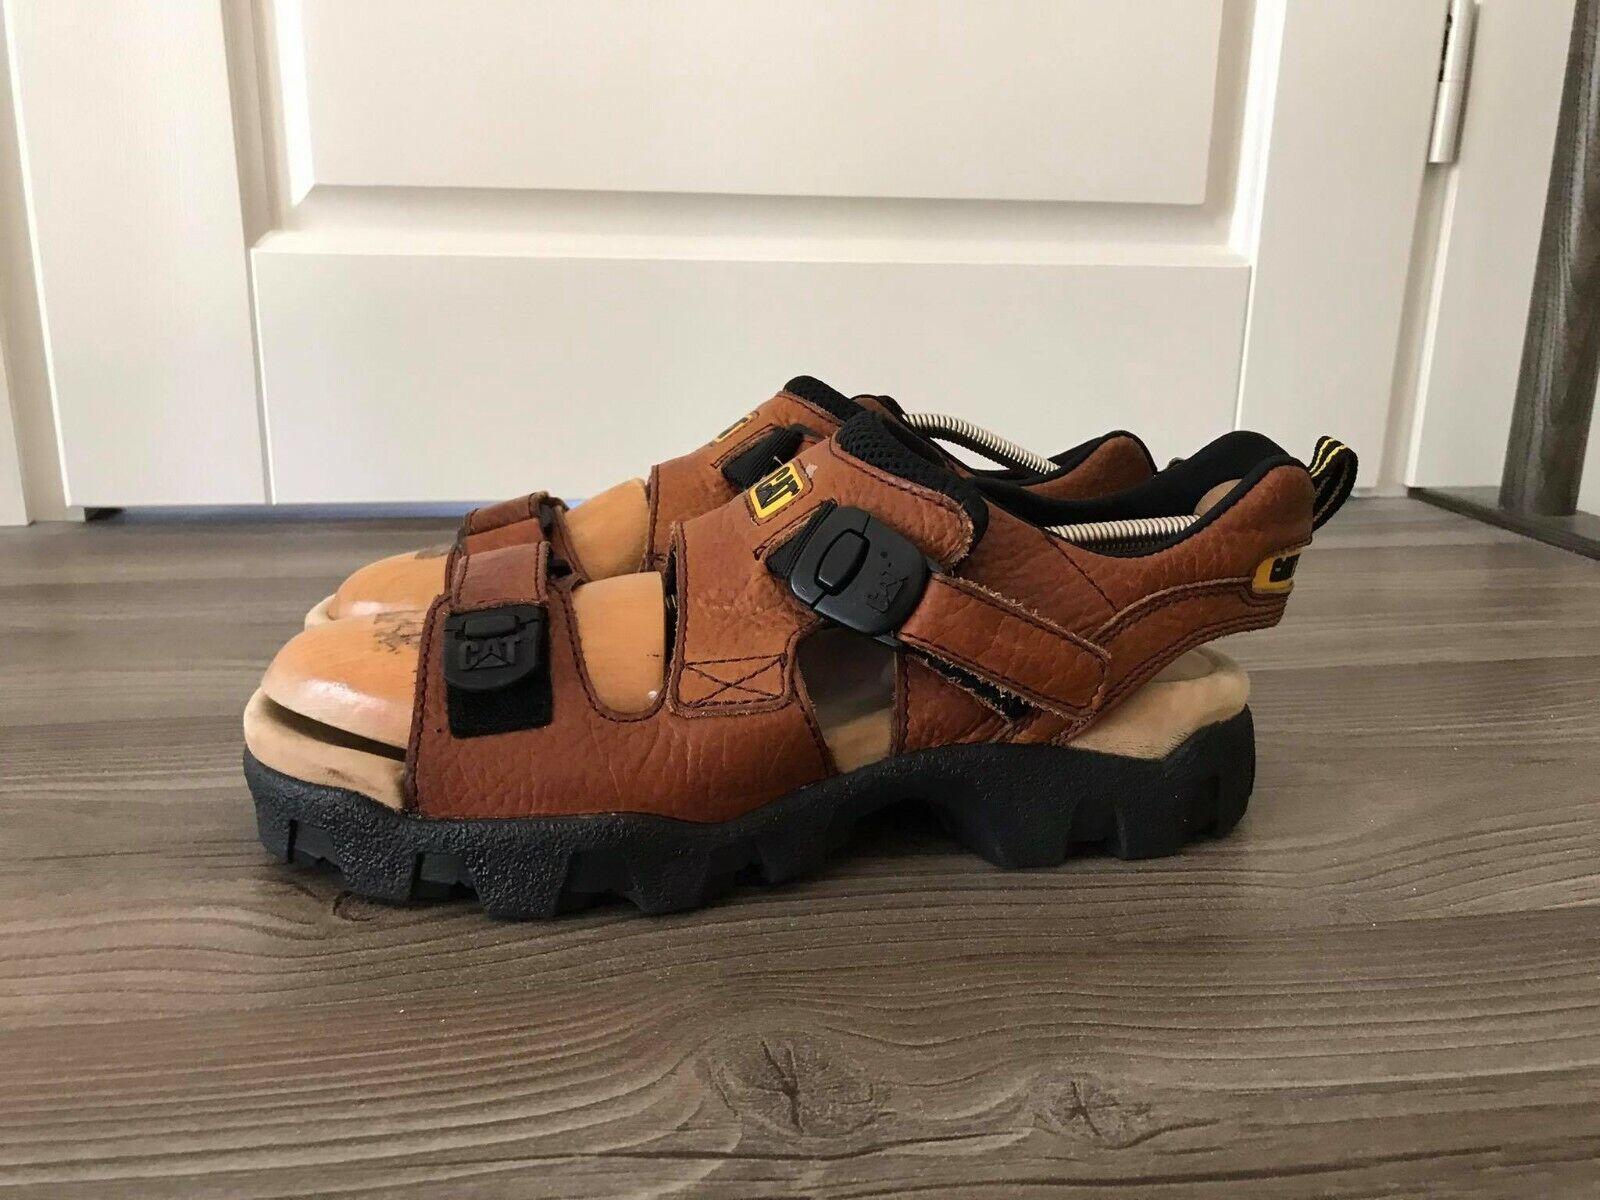 Caterpillar Men's Leather Sandals Size UK9